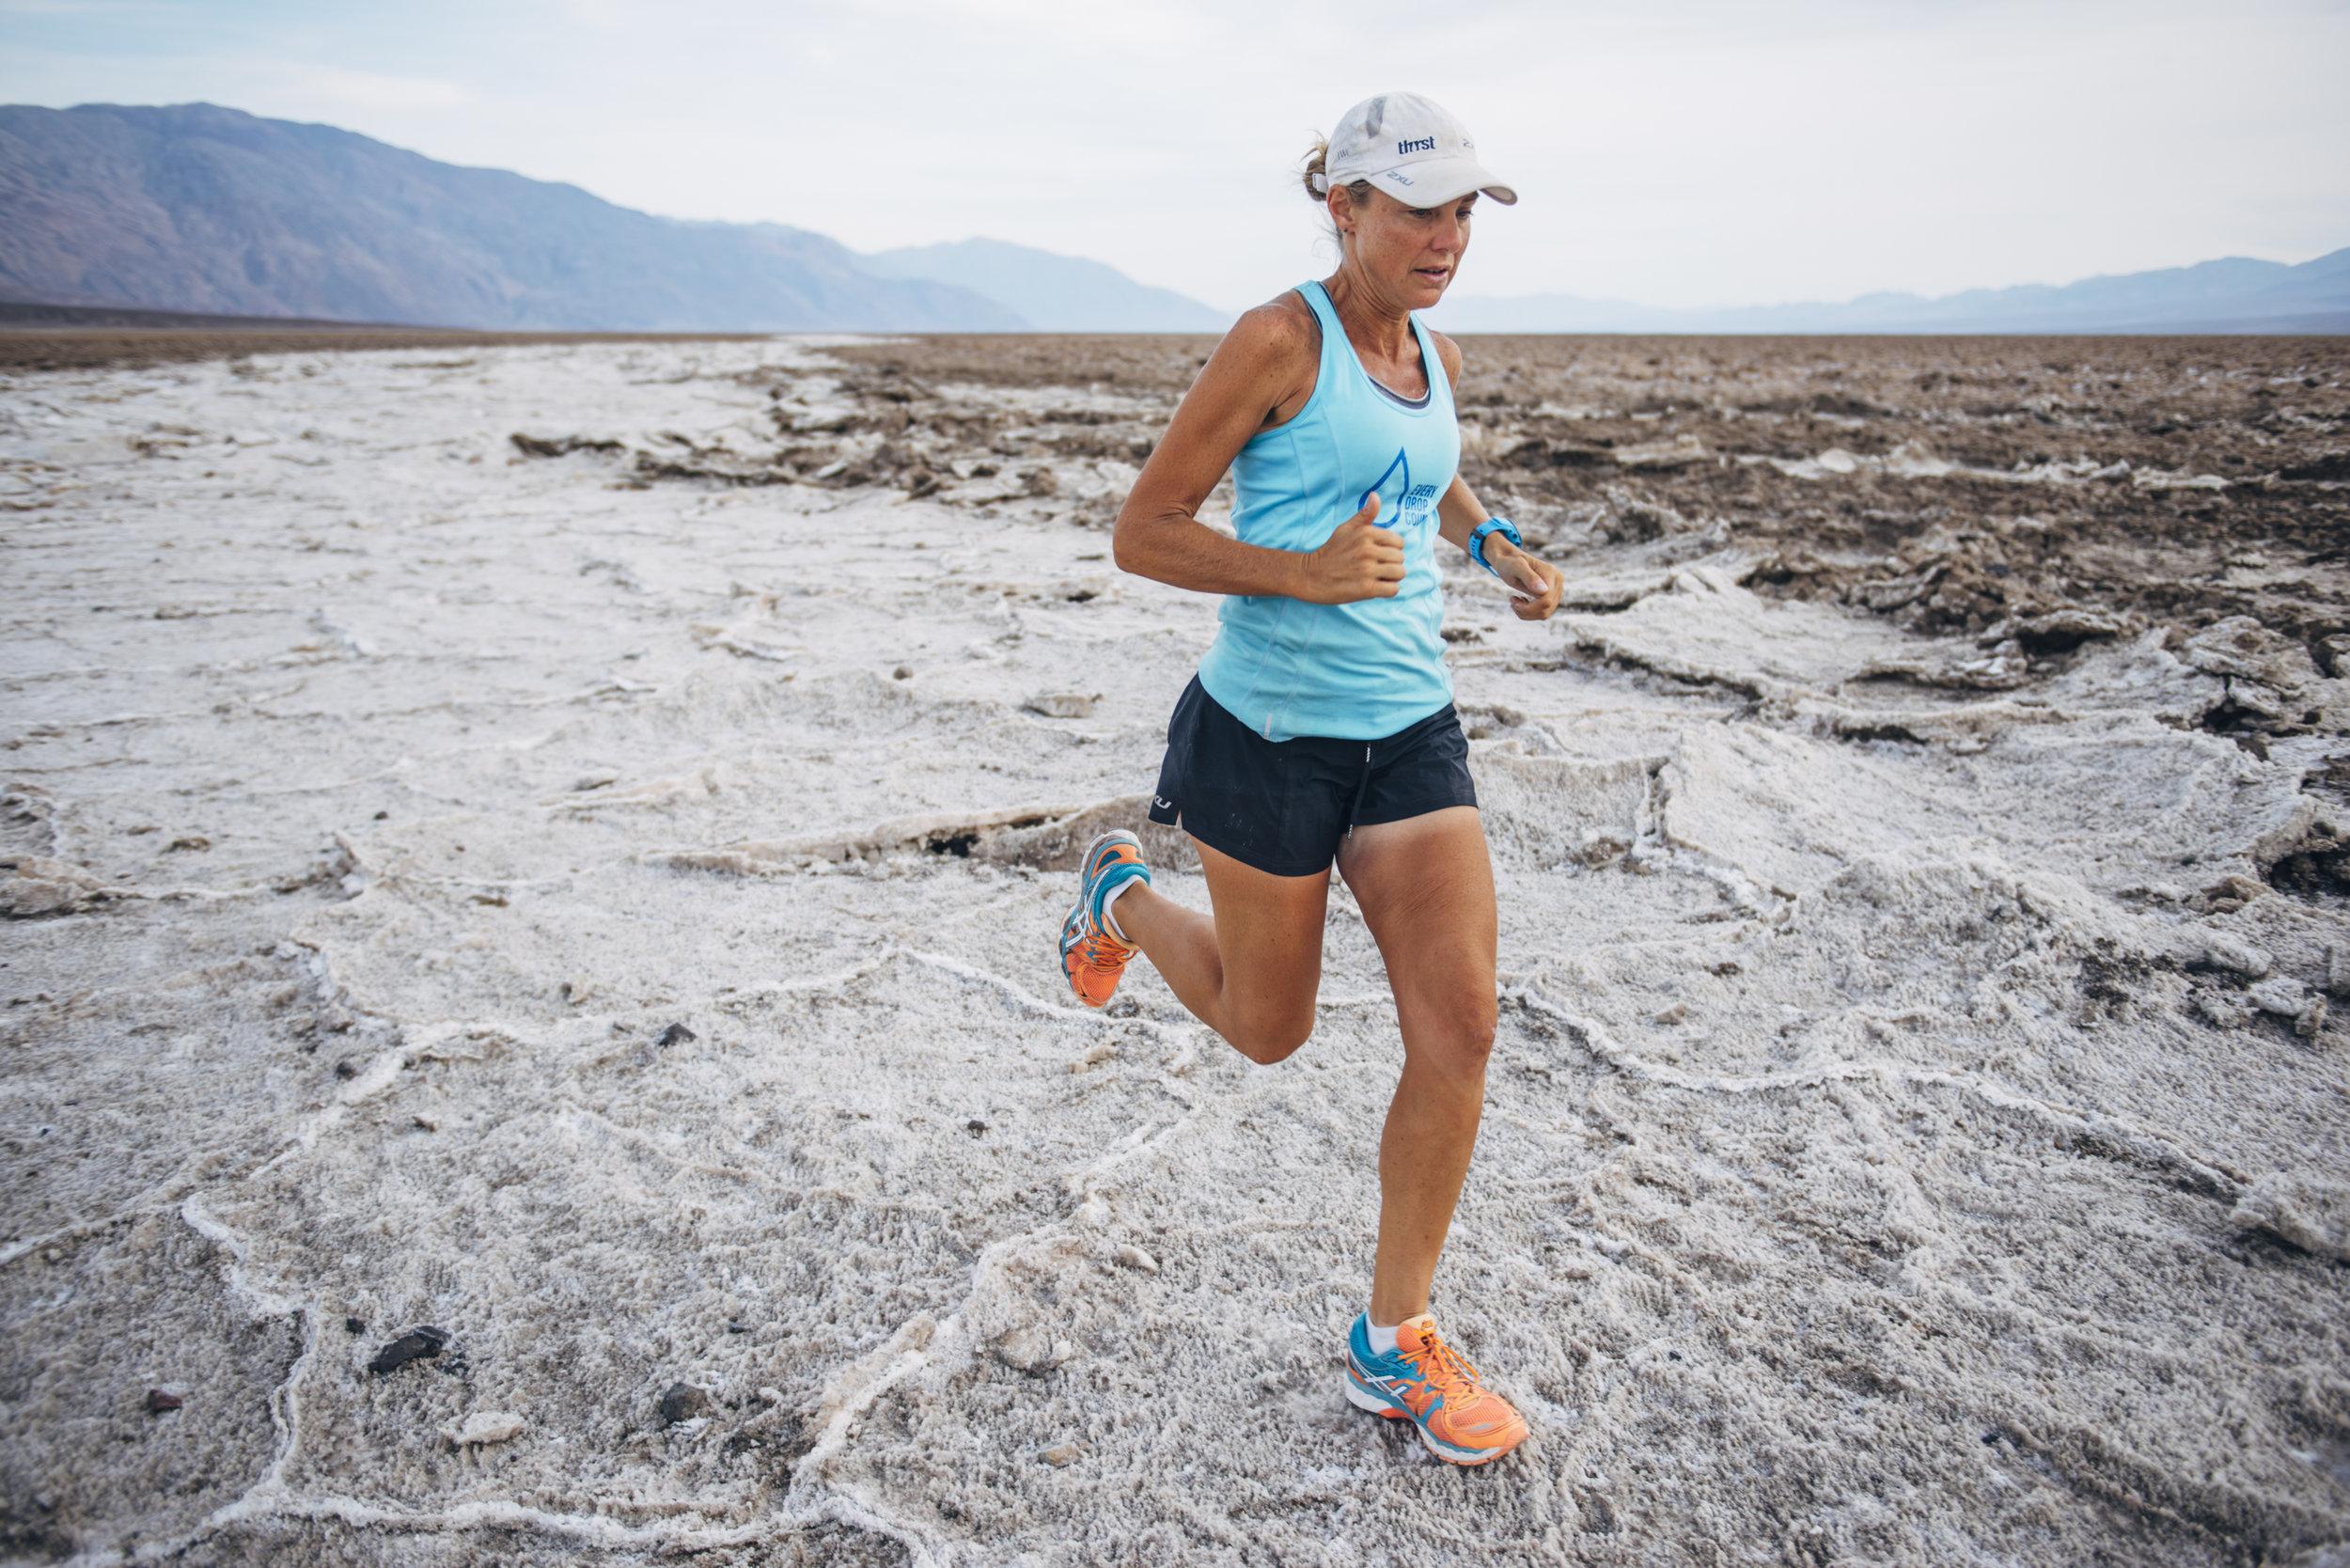 Mina Guli Running in Chile